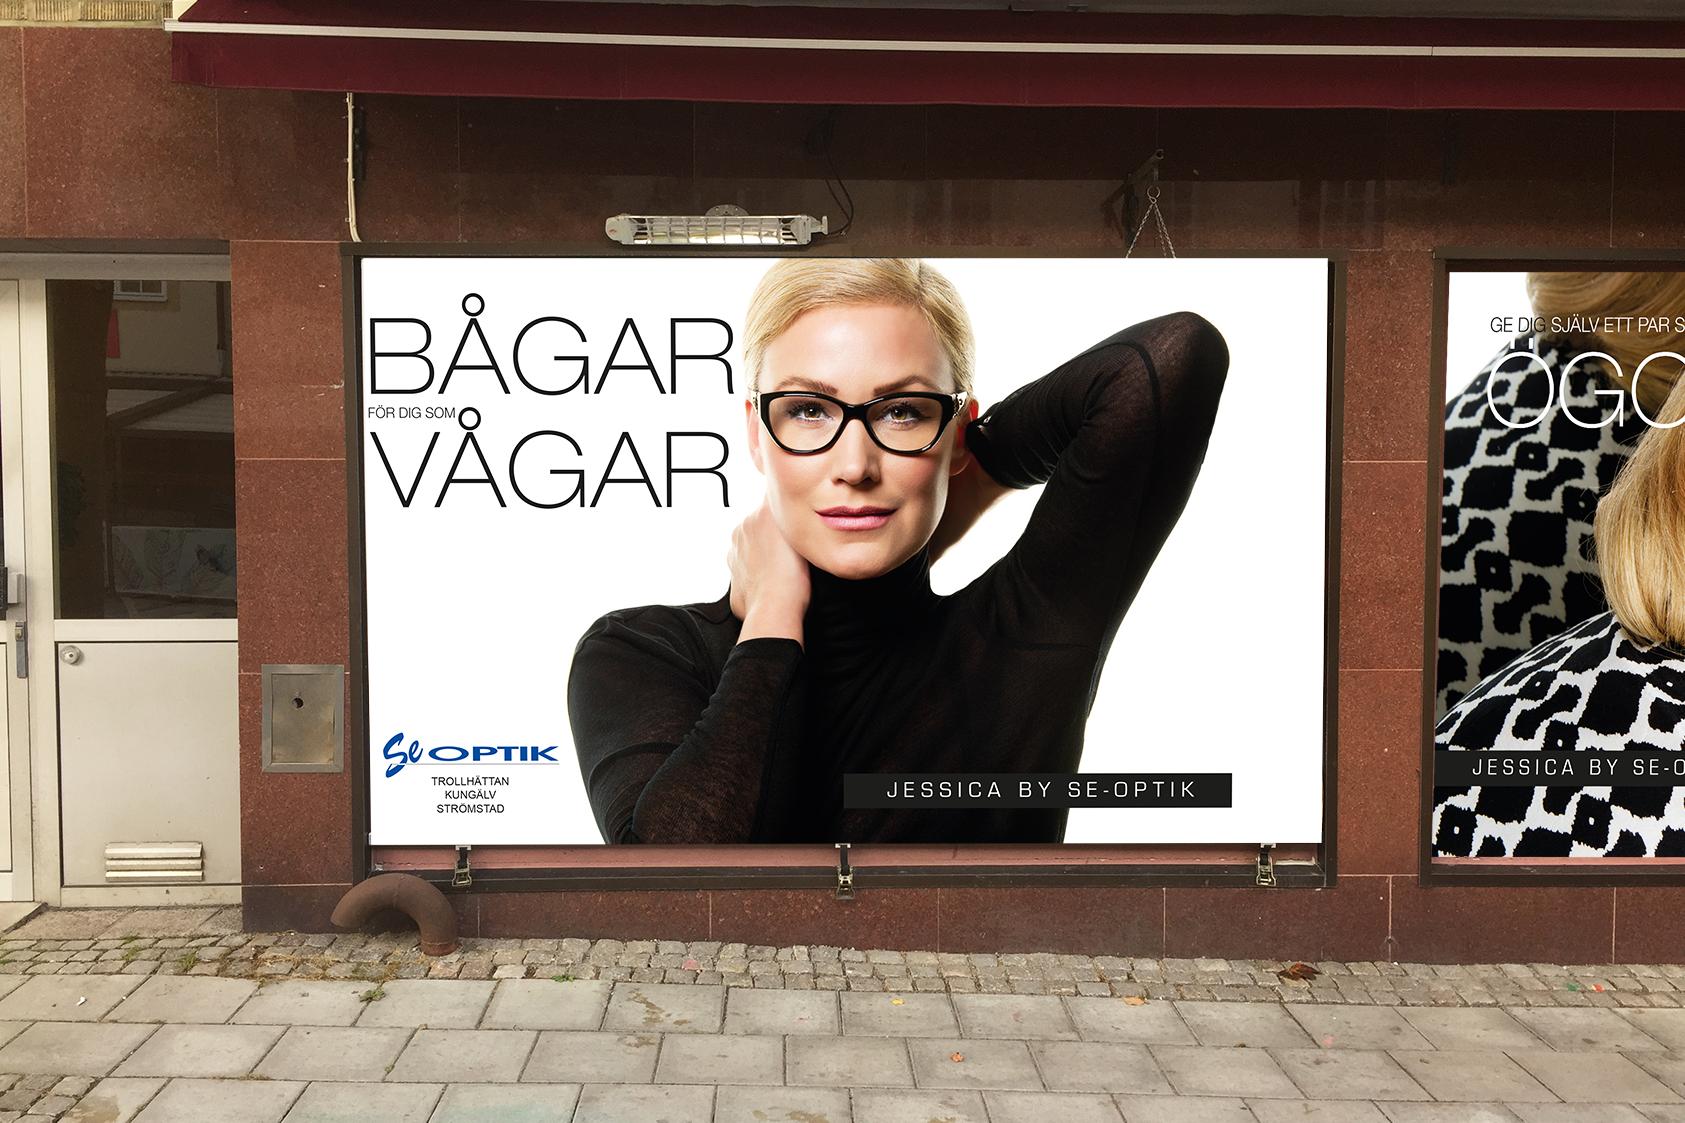 Se-Optiks kampanj med Jessica Andersson som huvudperson fortsätter.